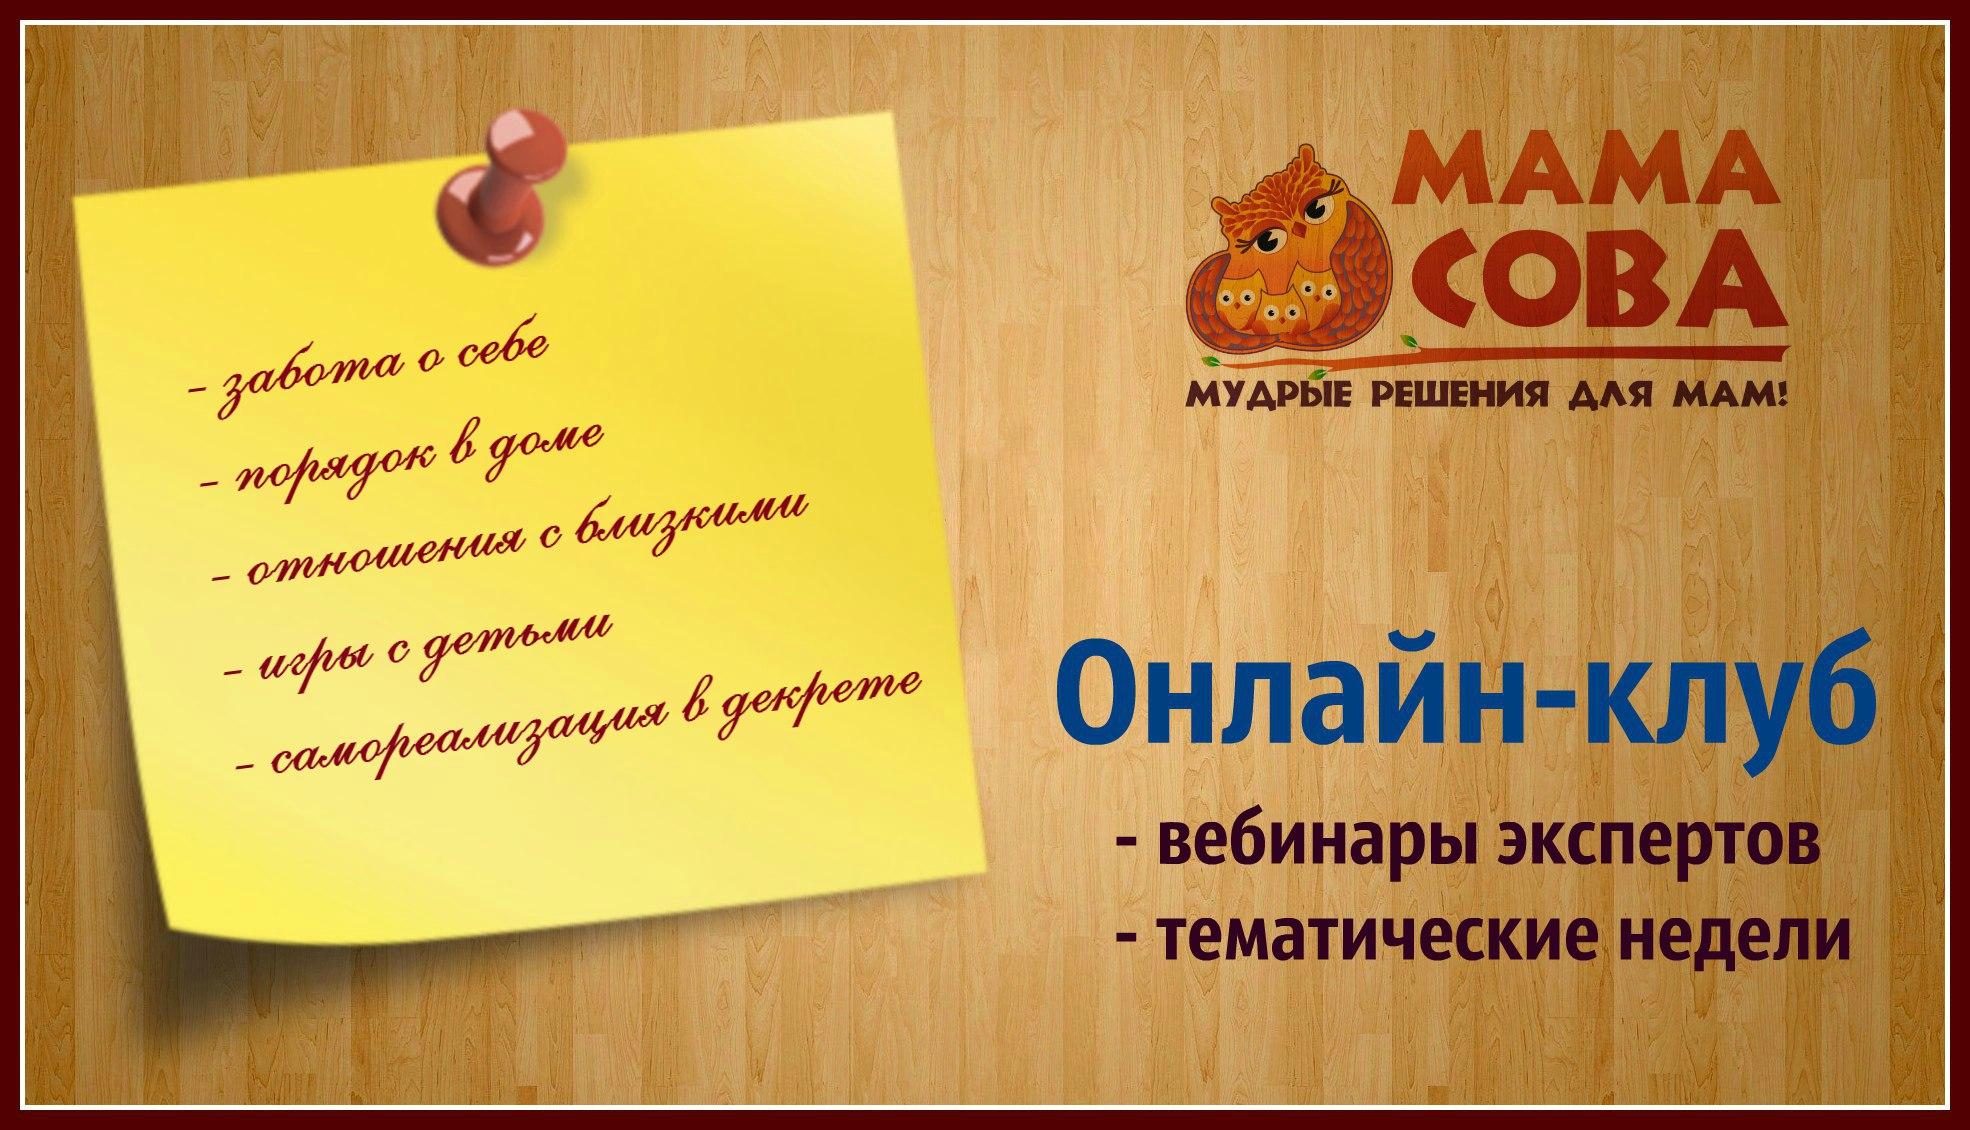 онлайн-клуб МАМА СОВА, вебинар, тематическая неделя, мама сова, Погодина